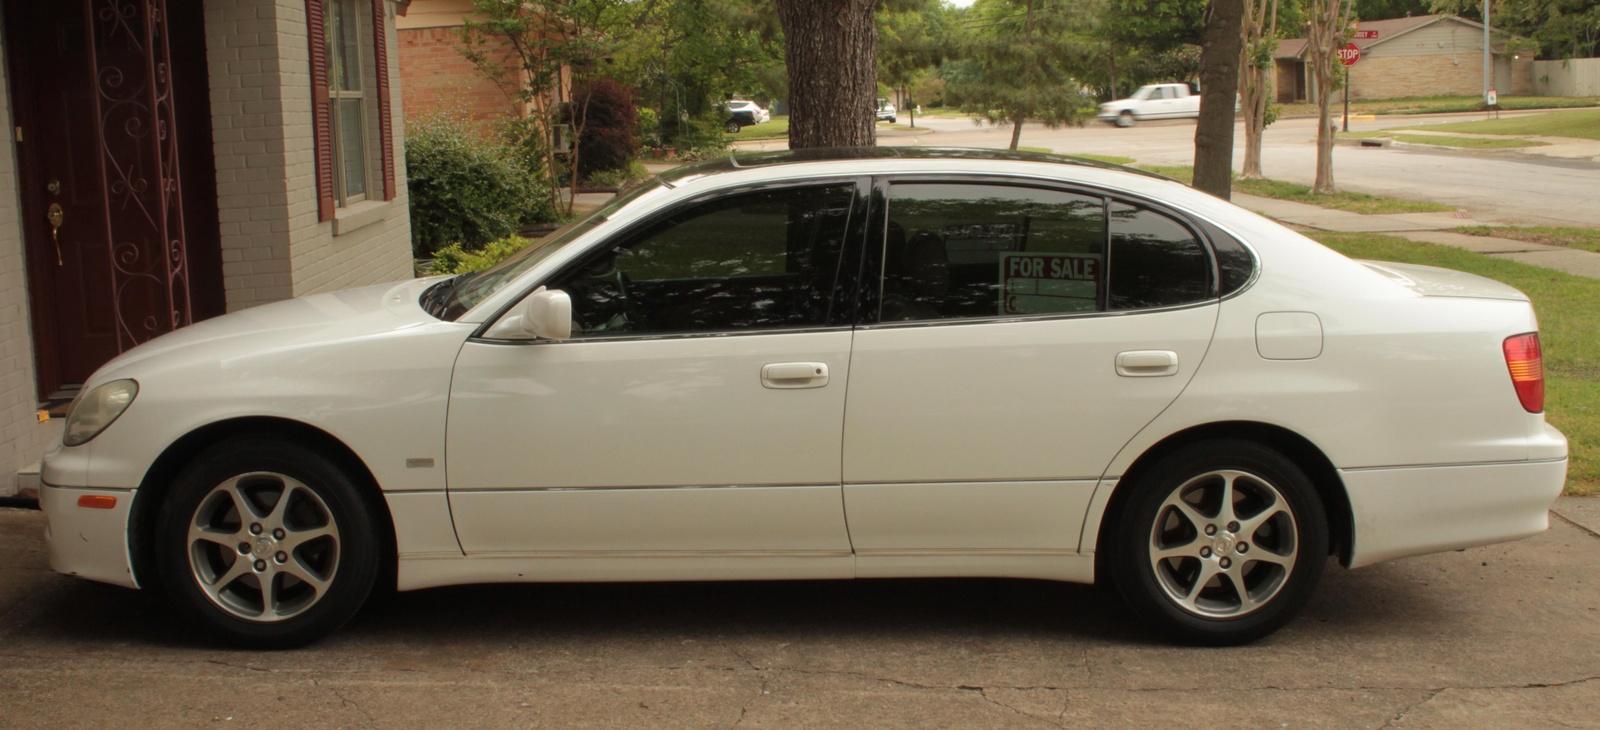 2005 Sale 450 Sc Lexus 4